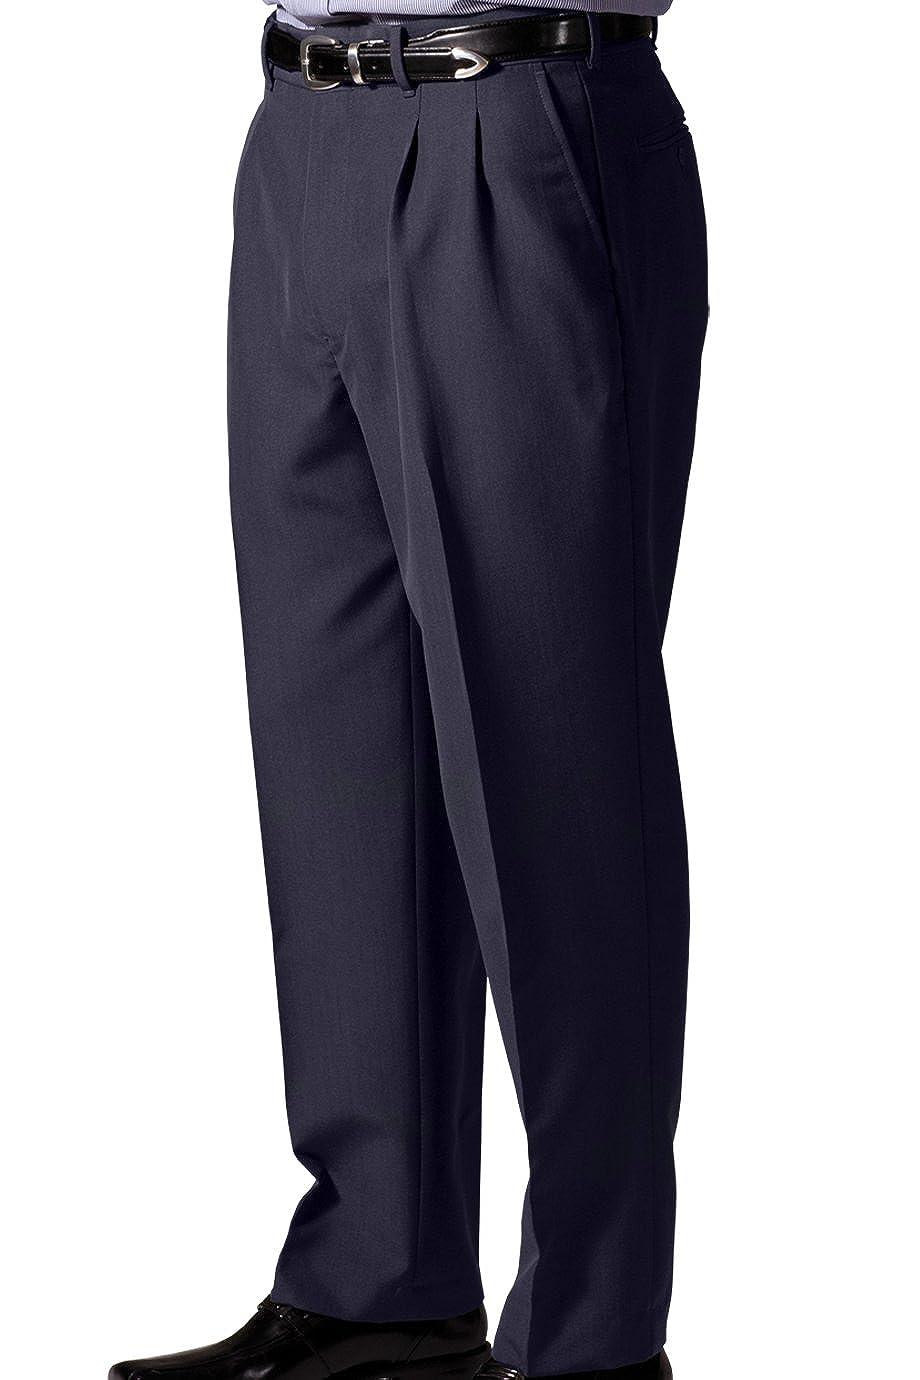 Navy 36-Ul Ed Garments MenS 2650 One Back Pocket Dress Pants